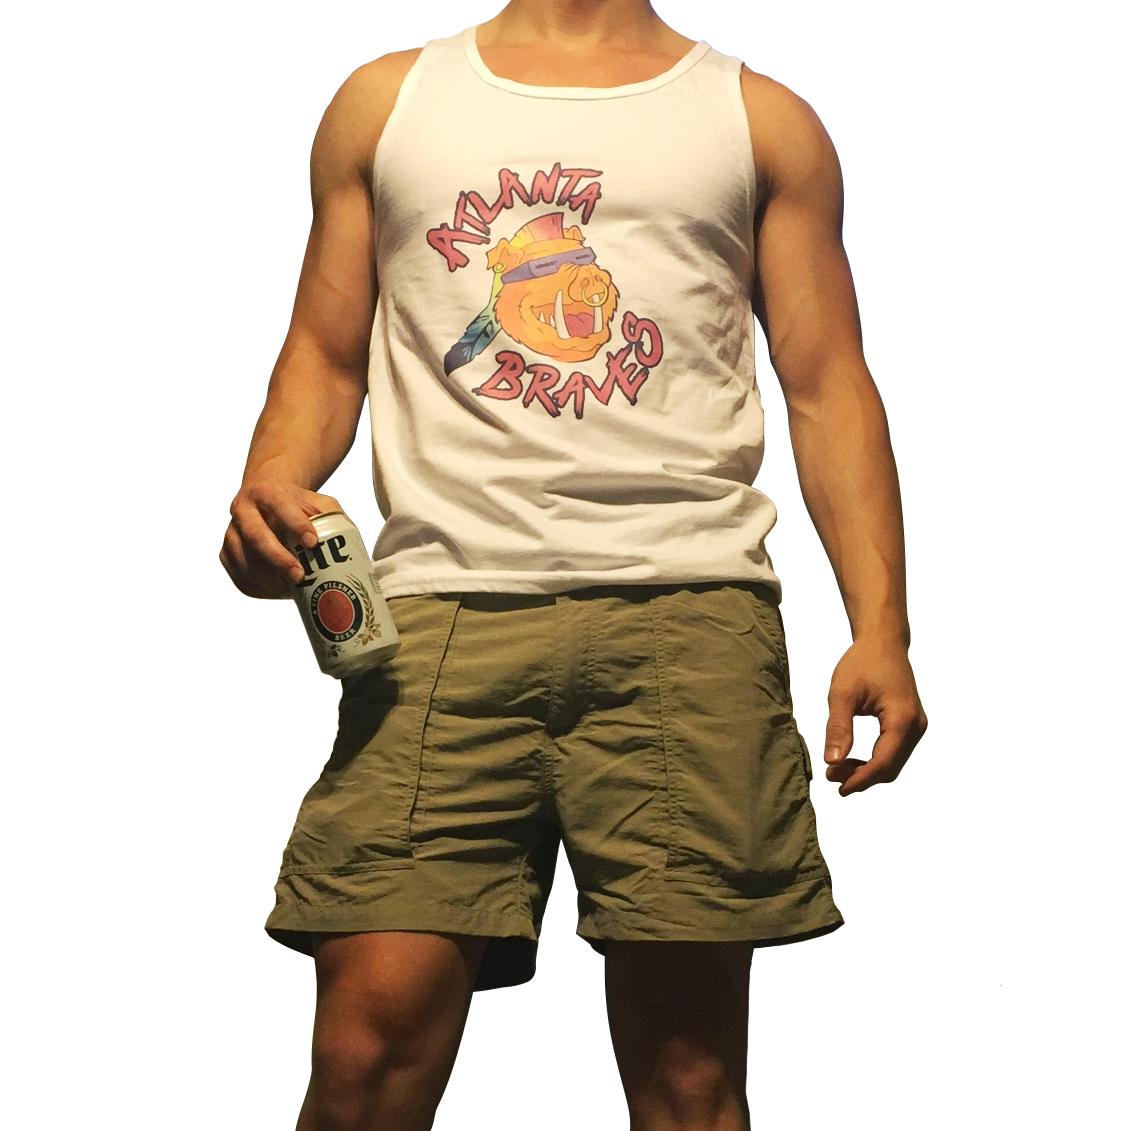 john-copponex-miscellaneous-bebop-shirt.jpg